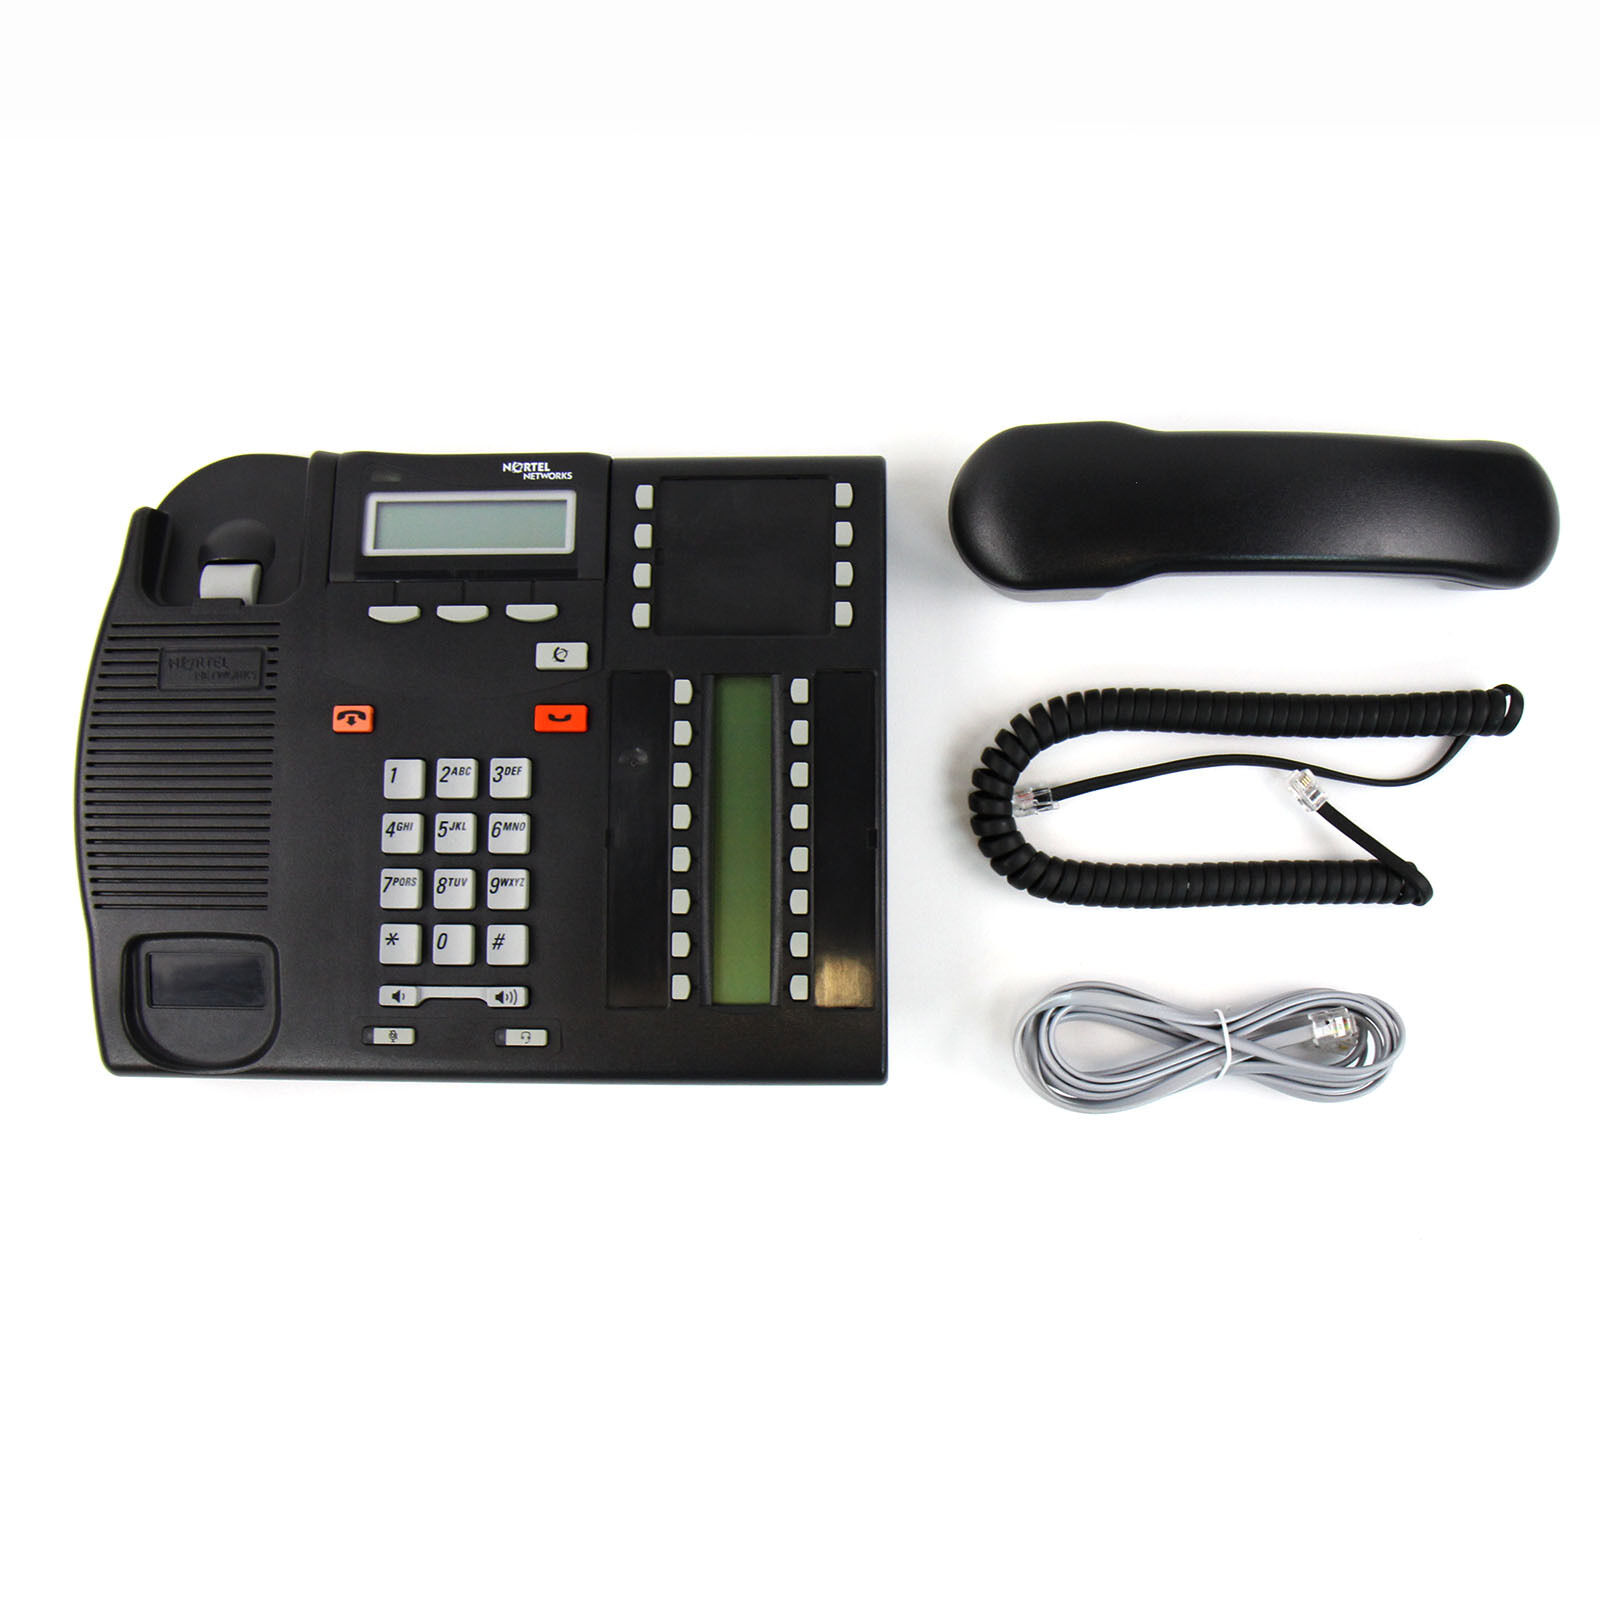 Nortel Norstar T7316 Charcoal Avaya Phone Lot Bulk Wundr Shop 4620 5620 Circuit Board